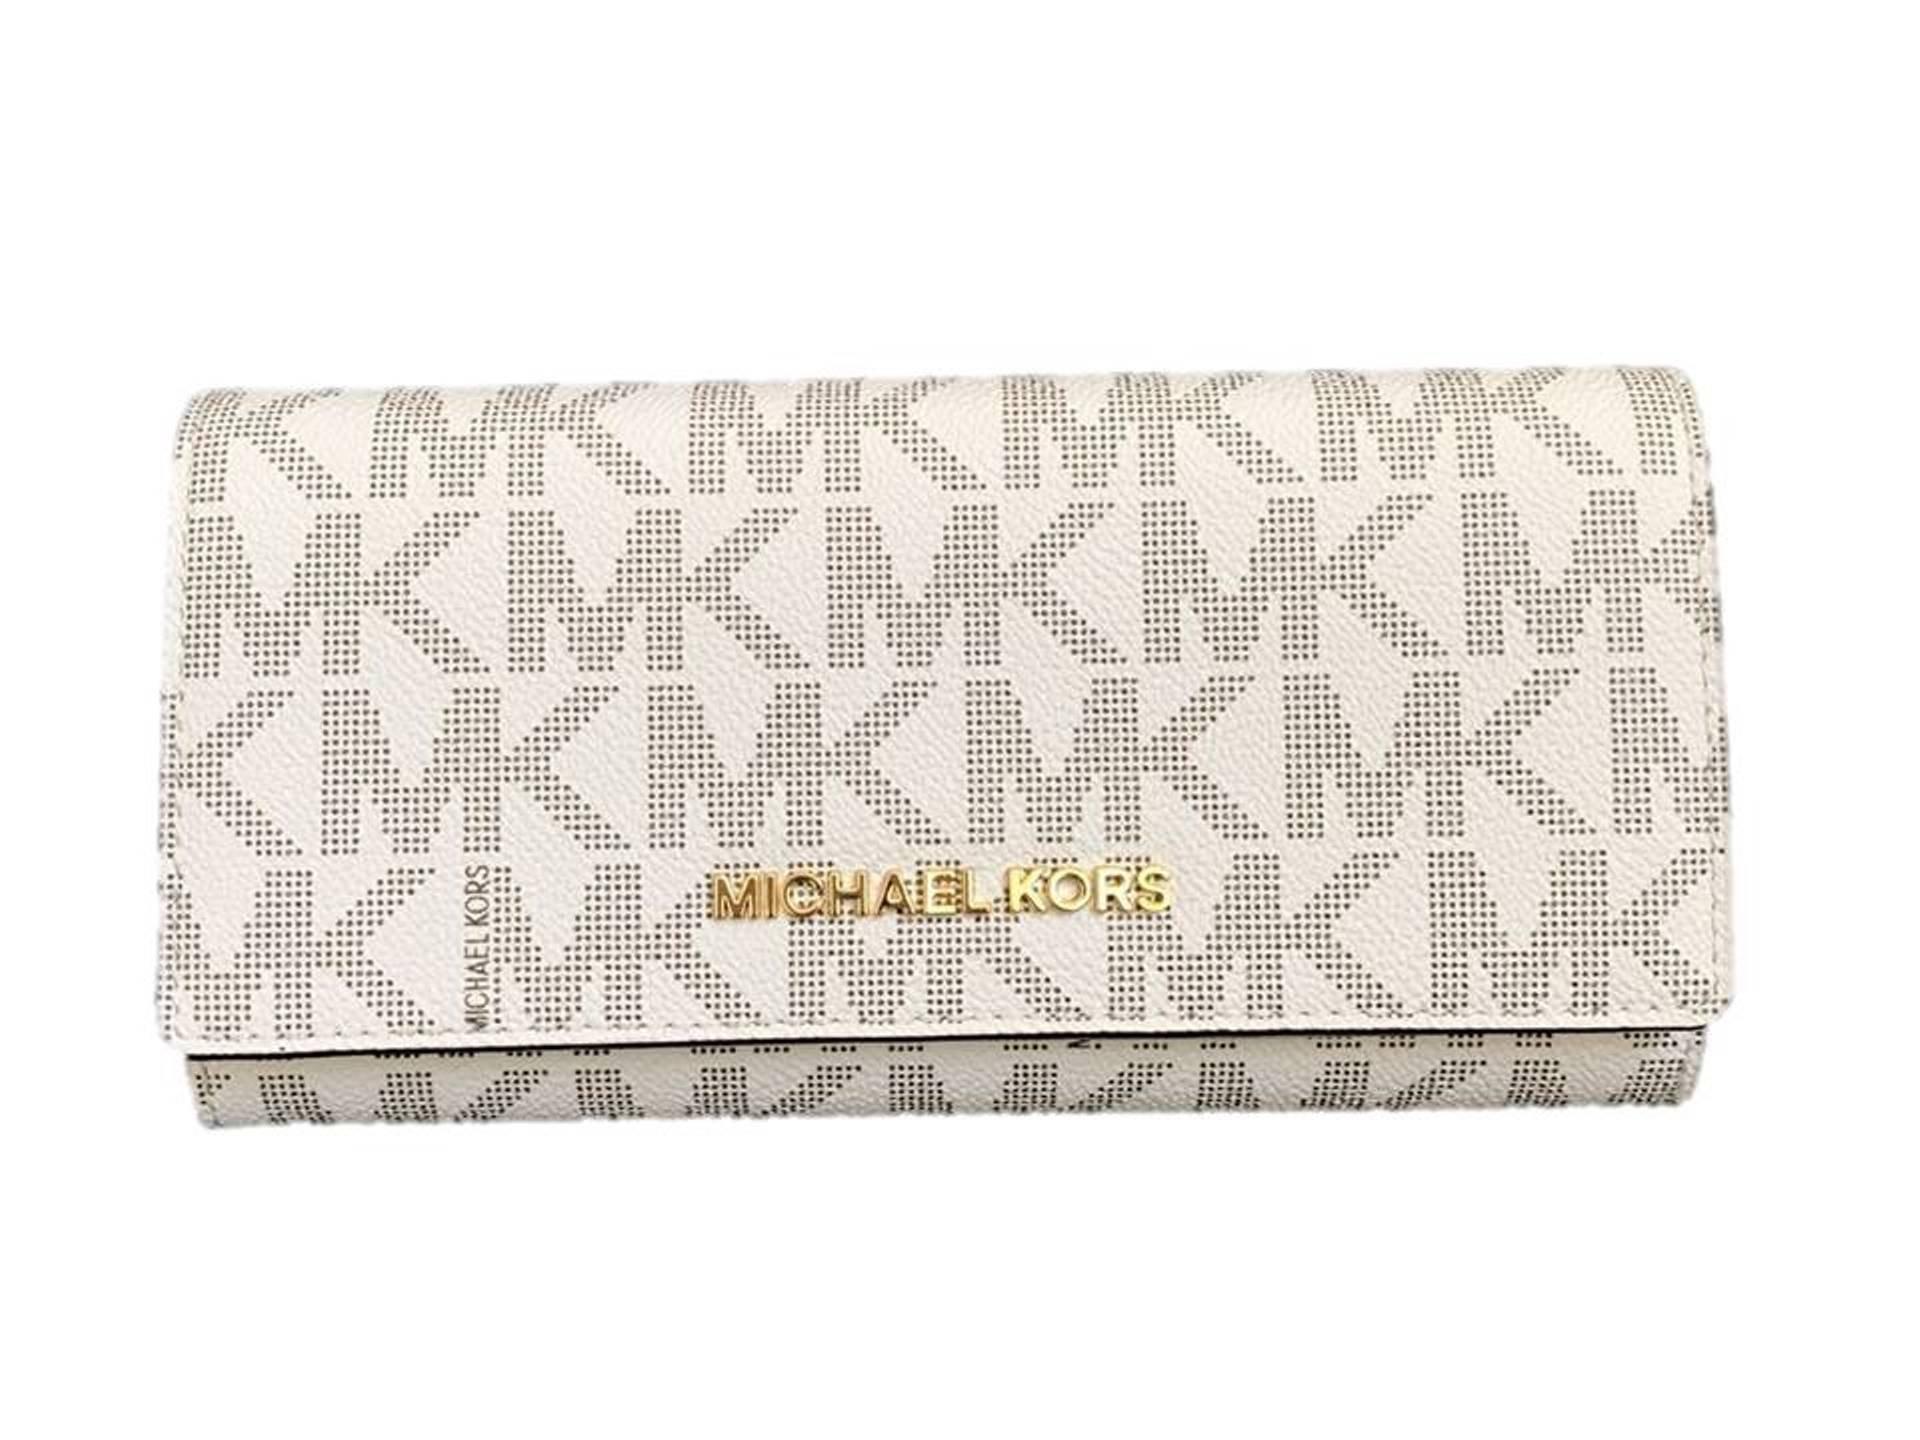 Michael Kors Jet Set Travel PVC Carryall Lettering Wallet